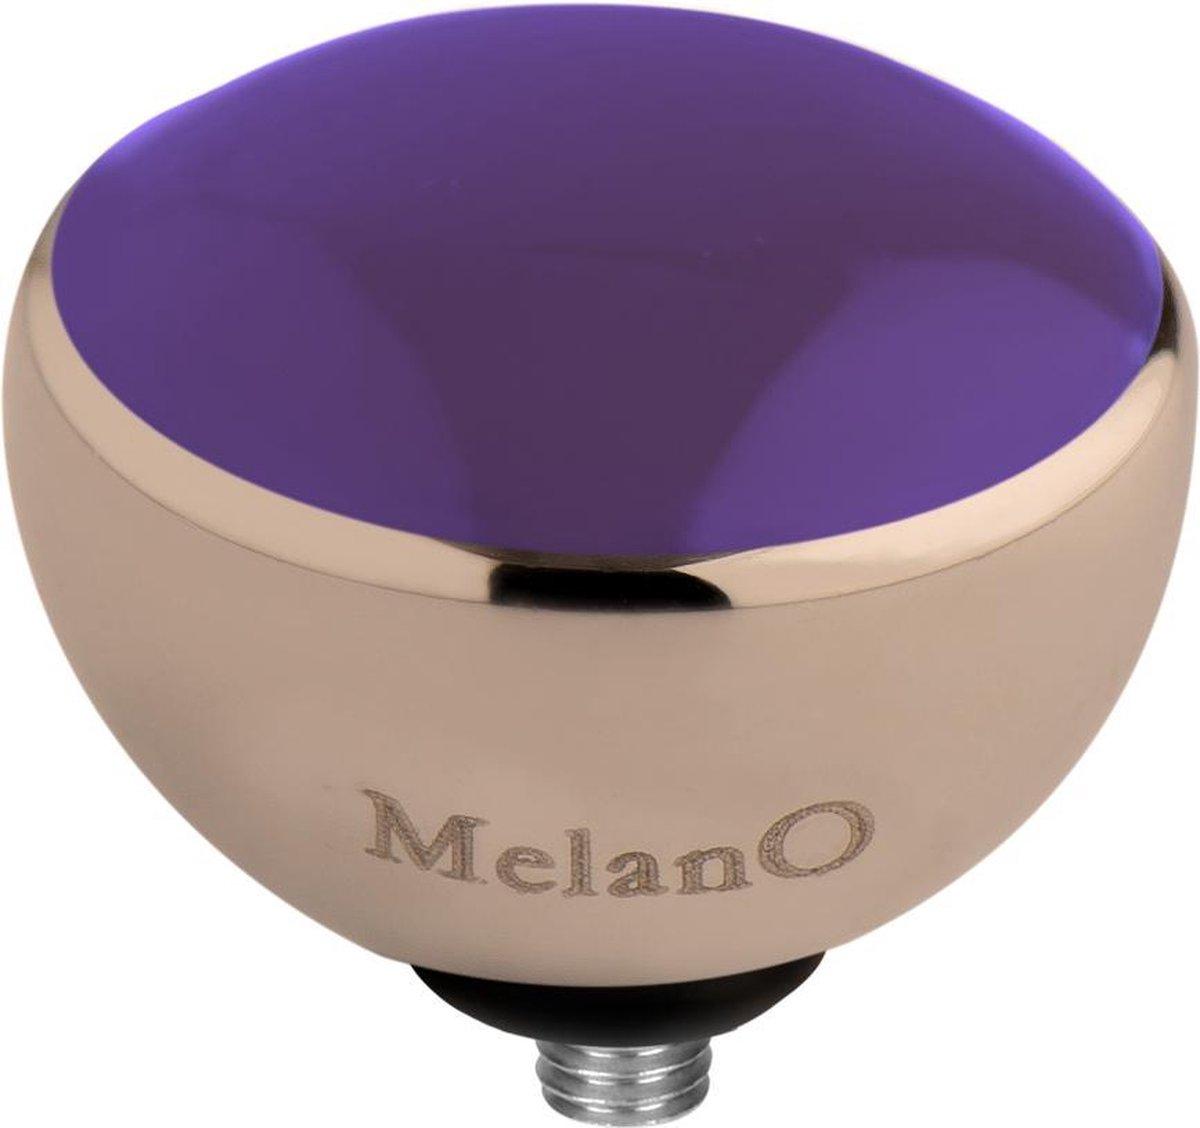 MelanO Twisted resin Meddy - dames - rosegoldplated + purple resin - 8mm - Melano